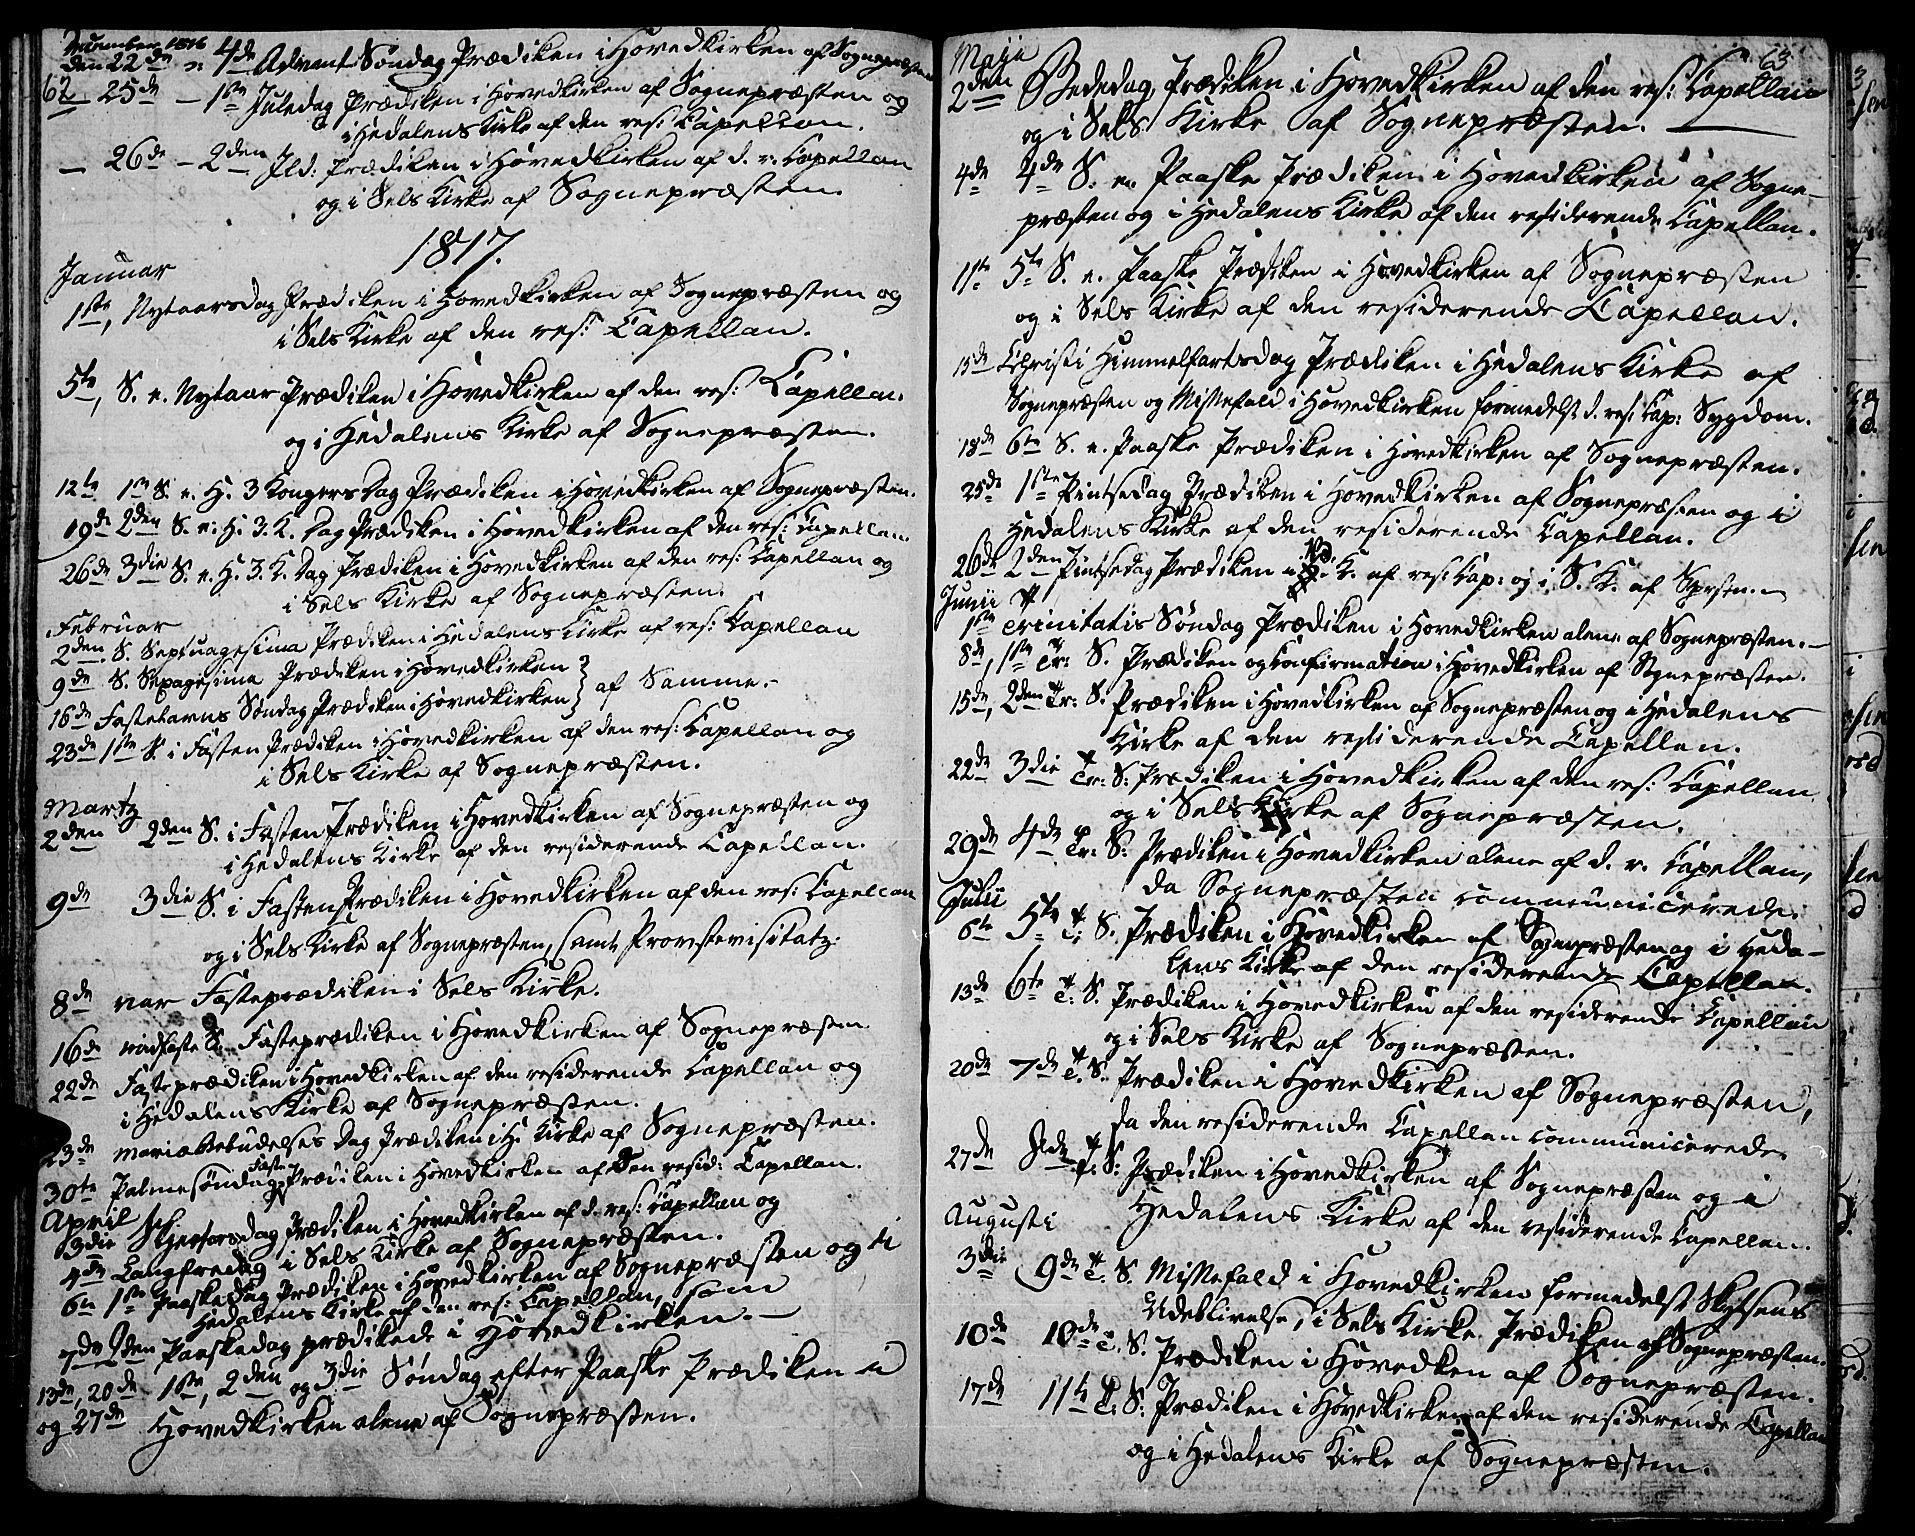 SAH, Vågå prestekontor, Ministerialbok nr. 2, 1810-1815, s. 62-63